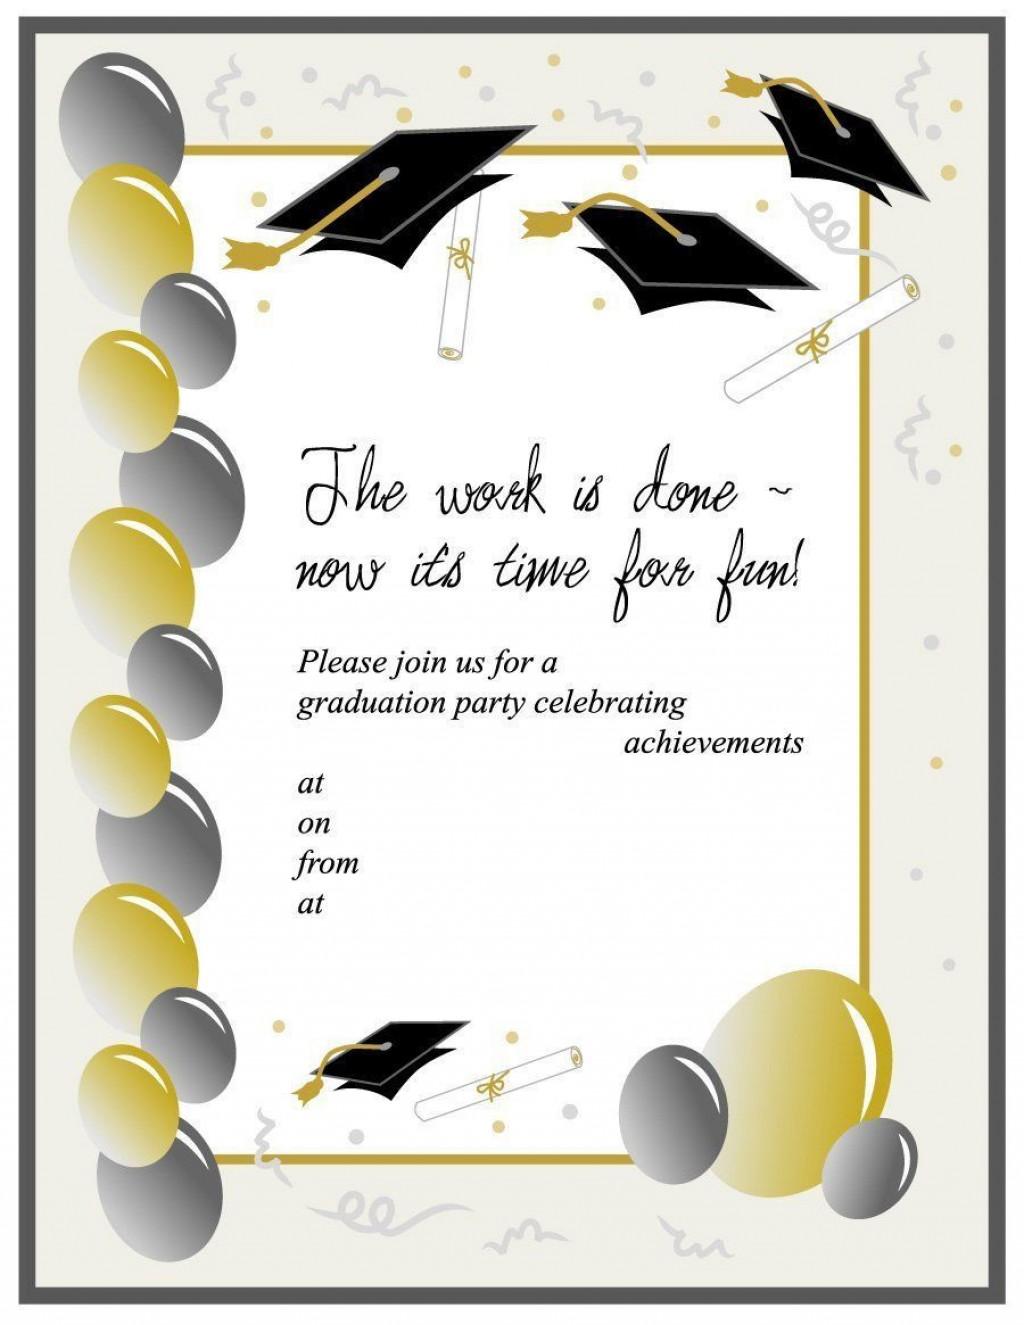 008 Unbelievable Free Graduation Invitation Template Printable Image  Kindergarten Party CardLarge